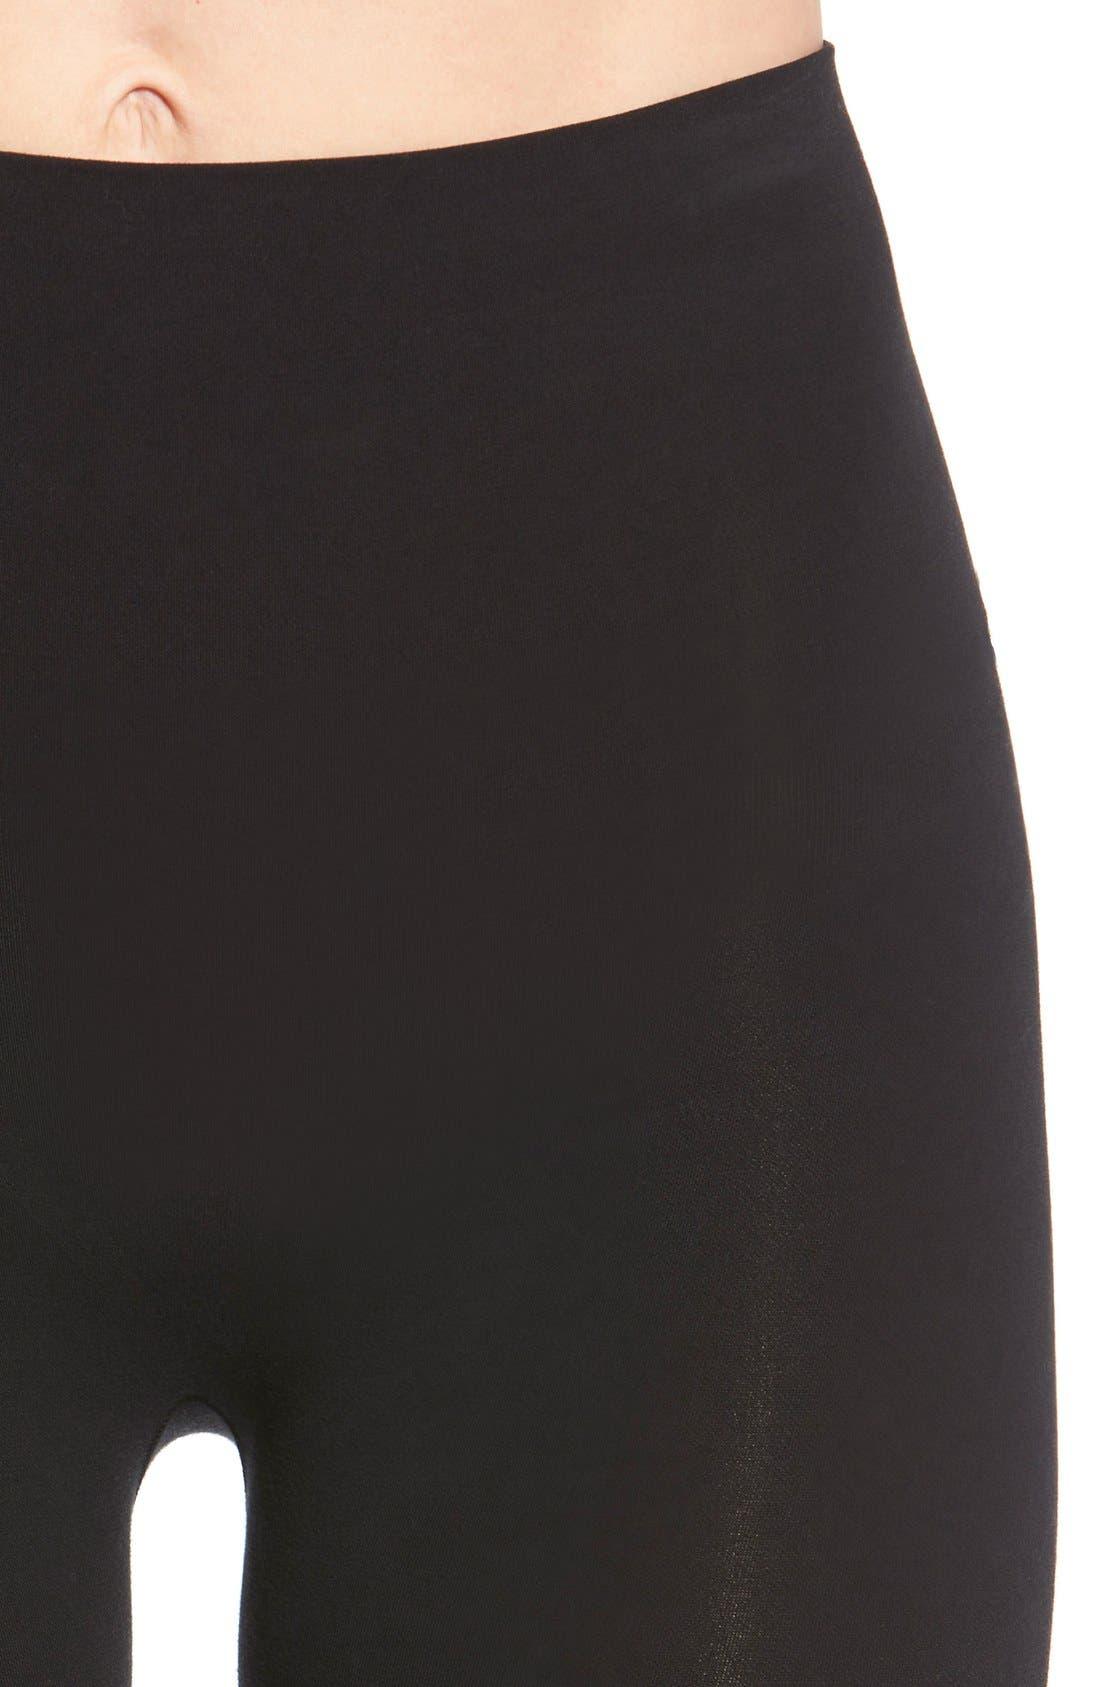 Alternate Image 4  - SPANX® 'Look-at-Me' Shaping Leggings